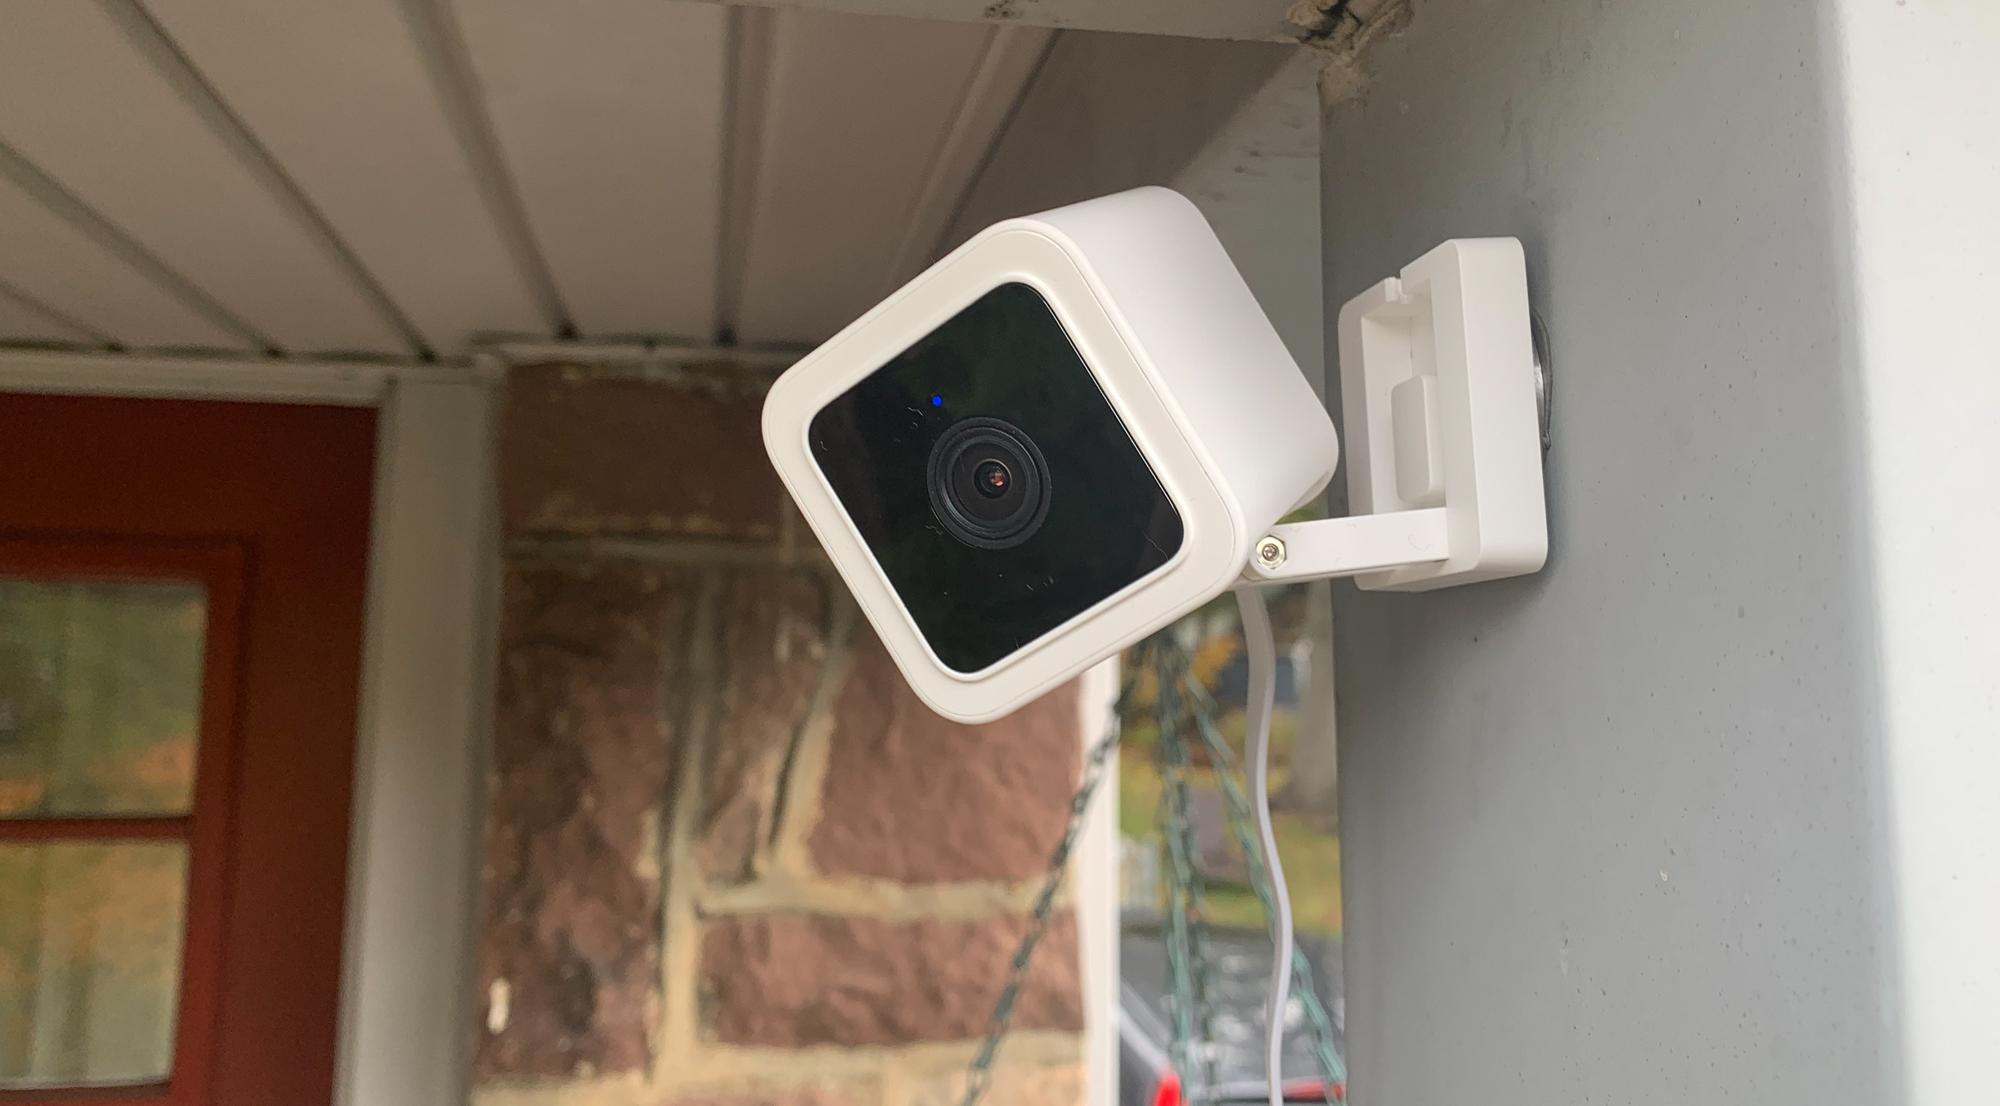 Best Home Security Cameras In 2021 Top Wireless Indoor And Outdoor Models Tom S Guide